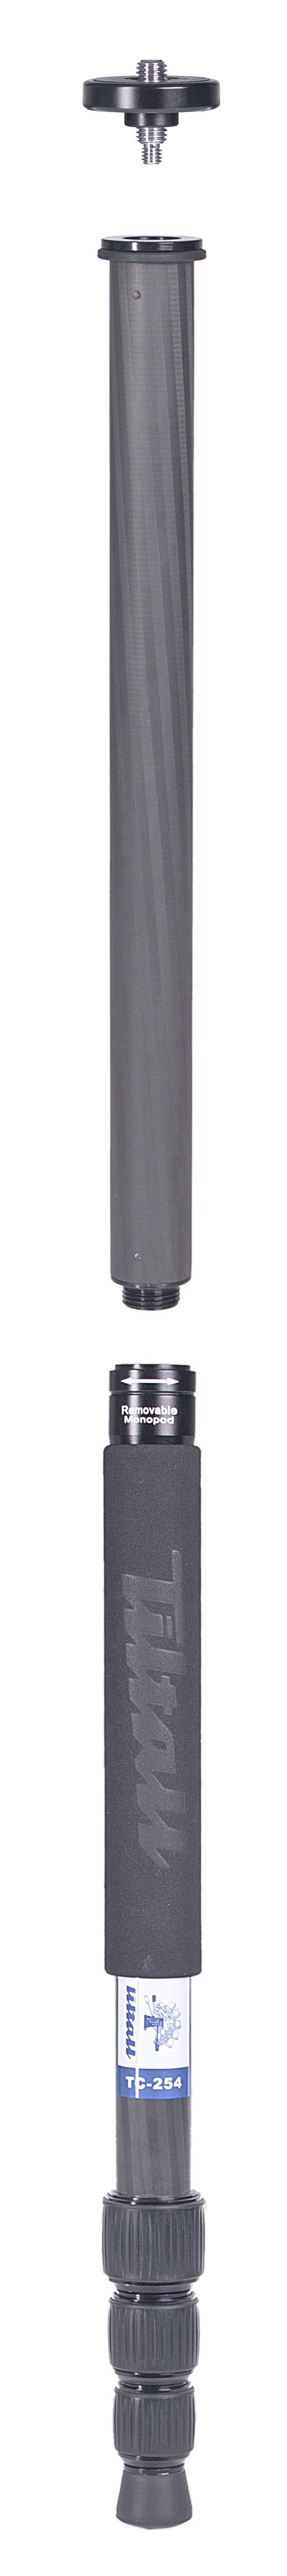 TILTALL Kamerastativ mit integriertem Einbeinstativ TE-254